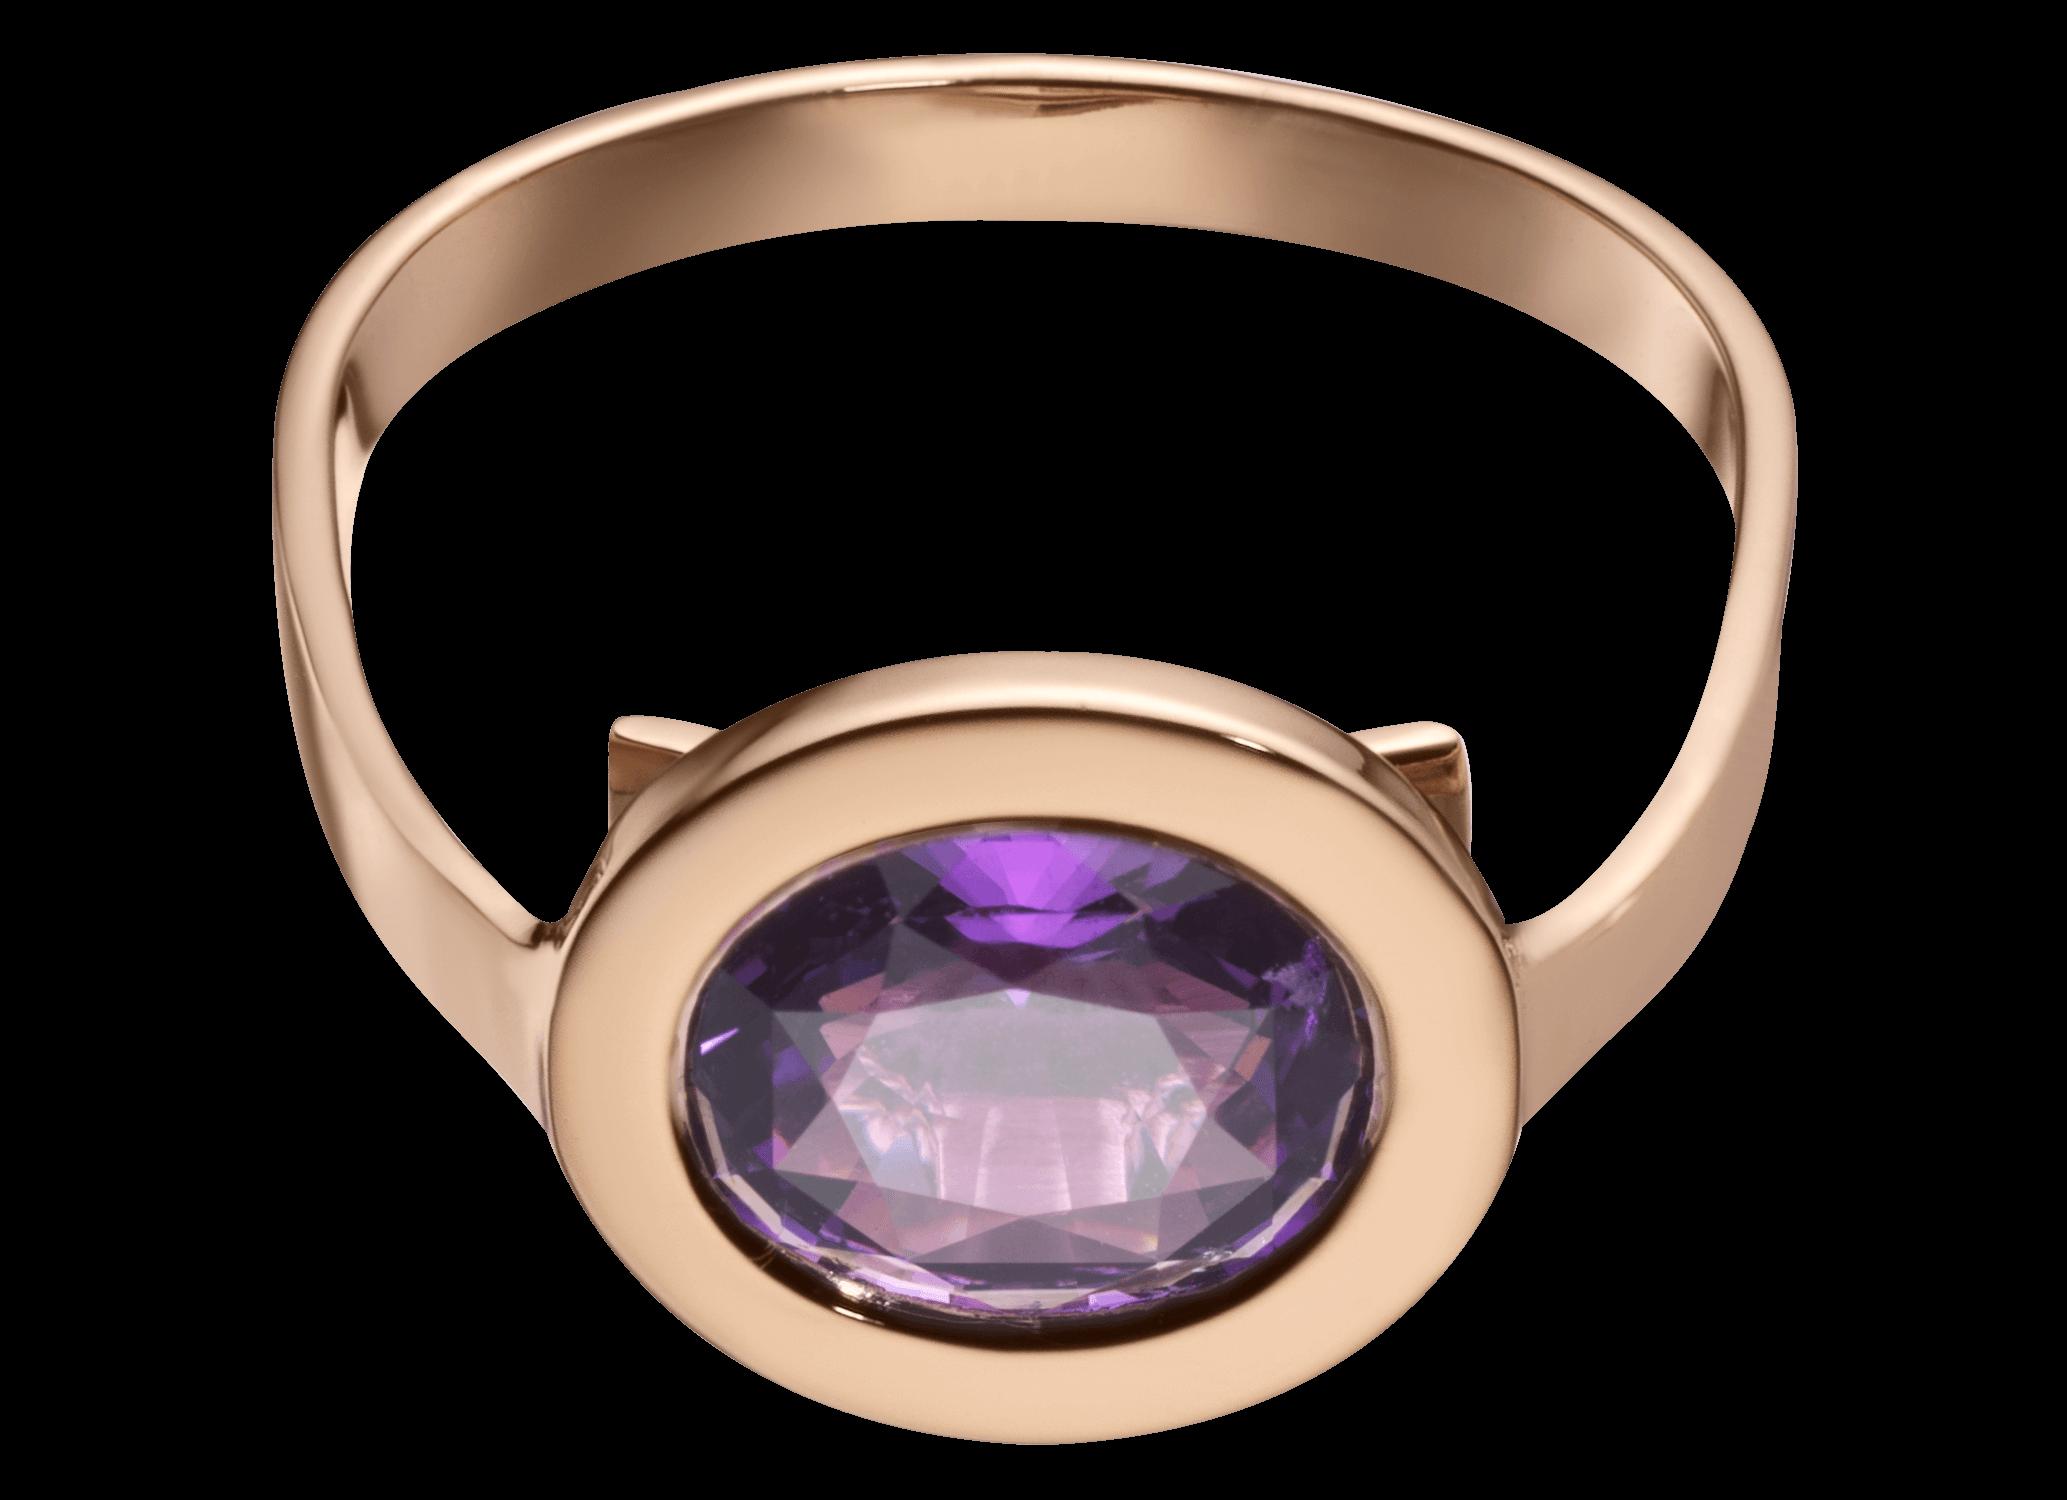 Bague Cha or rouge et saphir violet ovale 1,69 carat PNG web.png